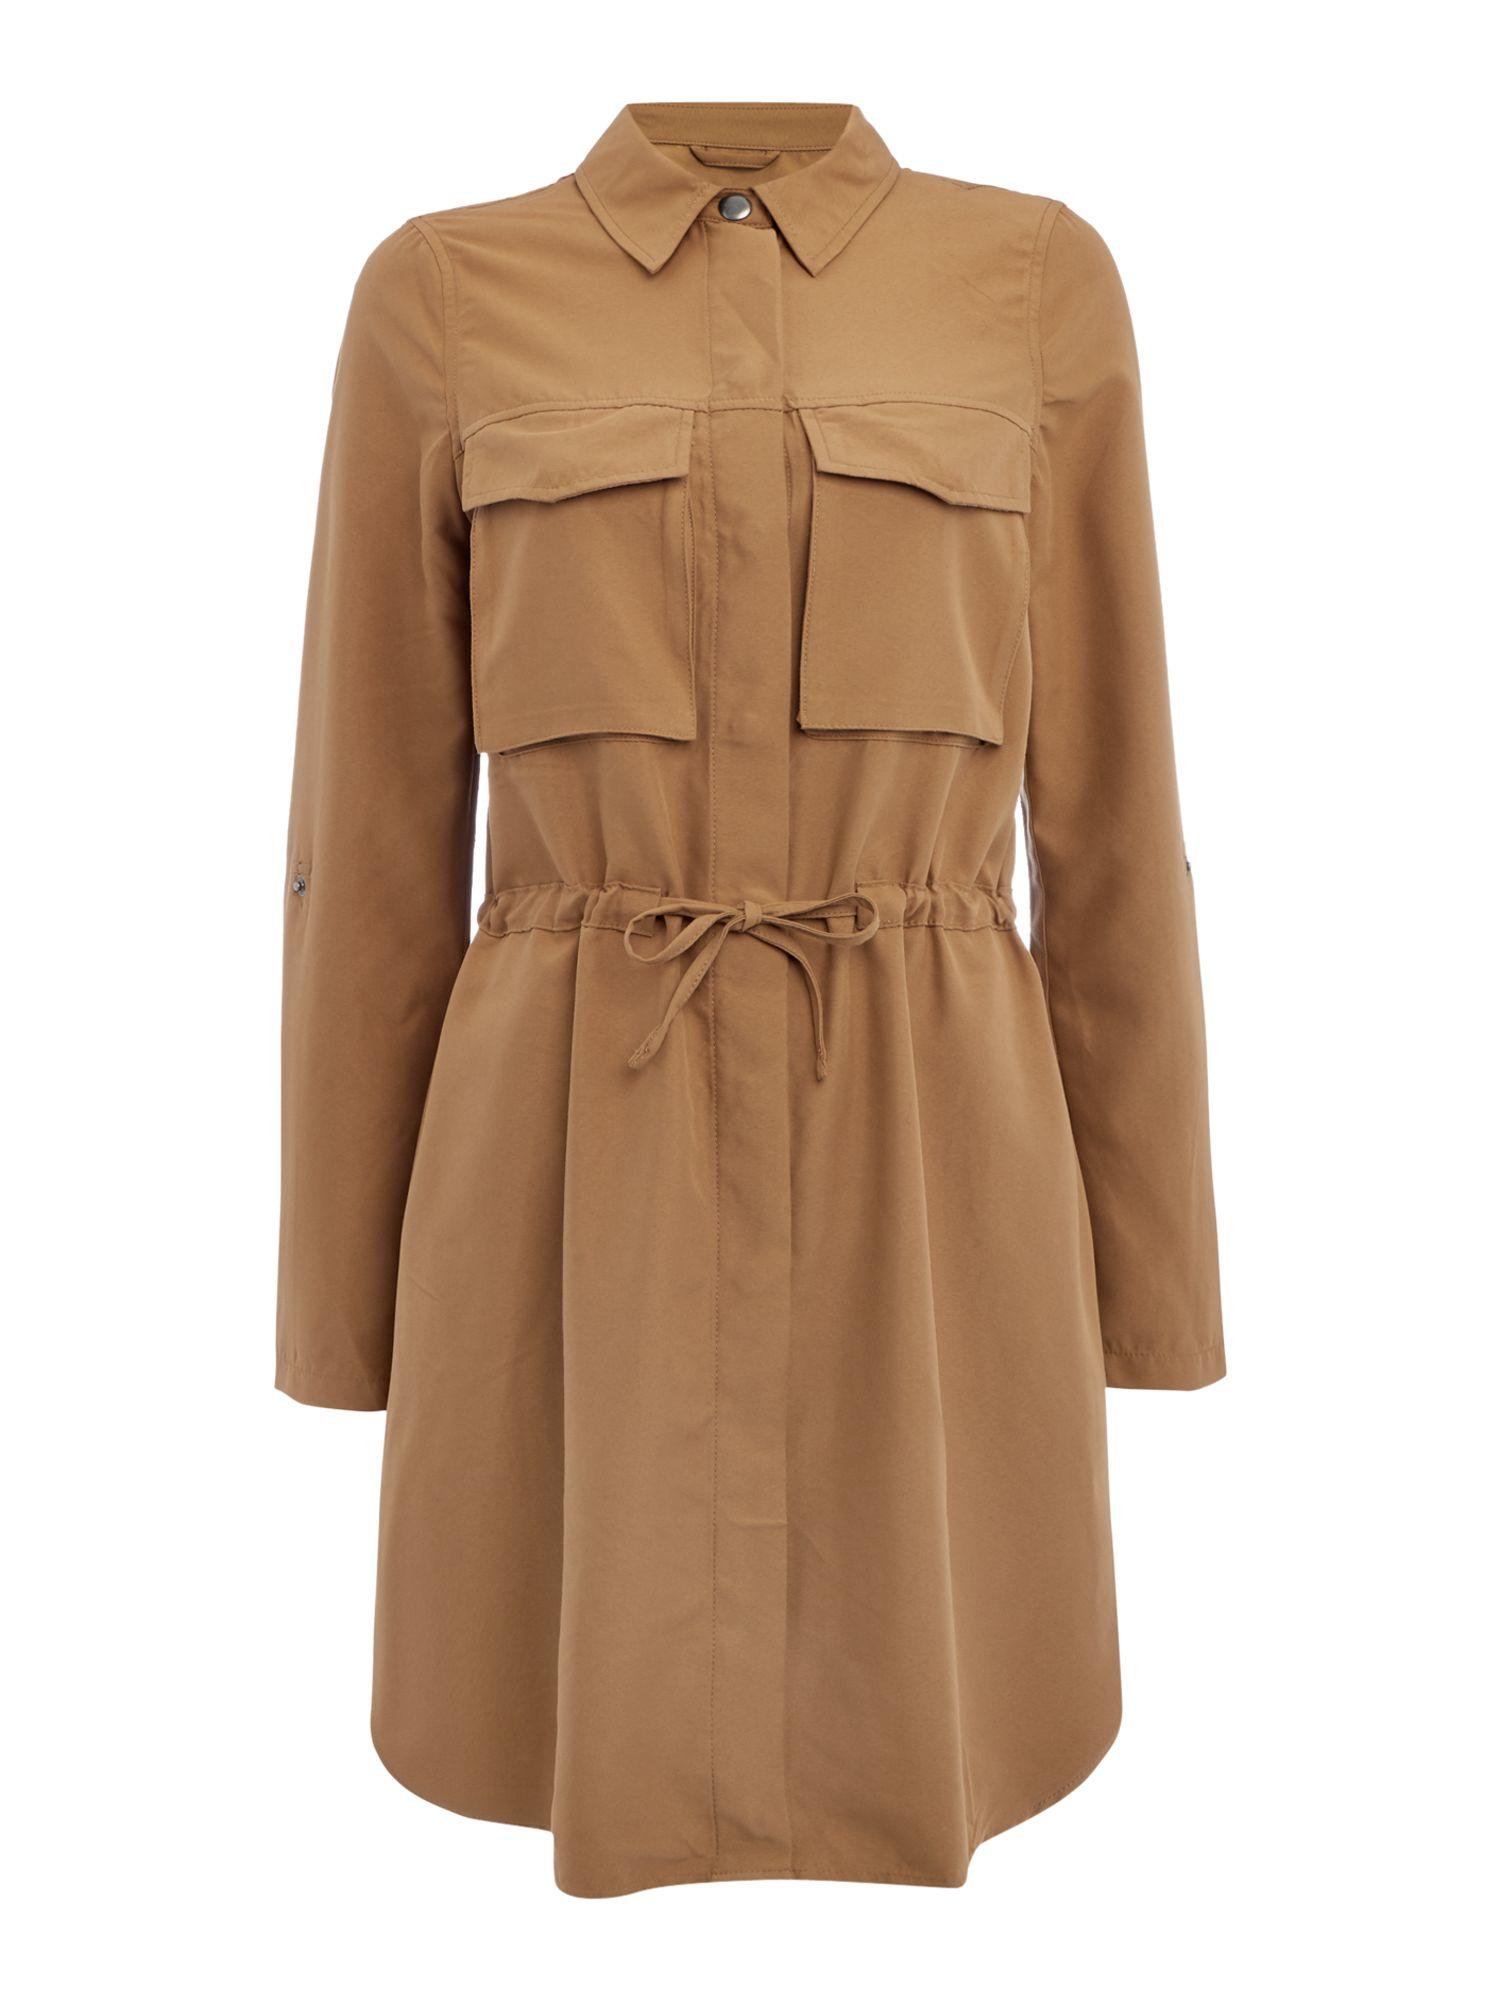 vero moda 3 4 sleeve jacket in brown lyst. Black Bedroom Furniture Sets. Home Design Ideas